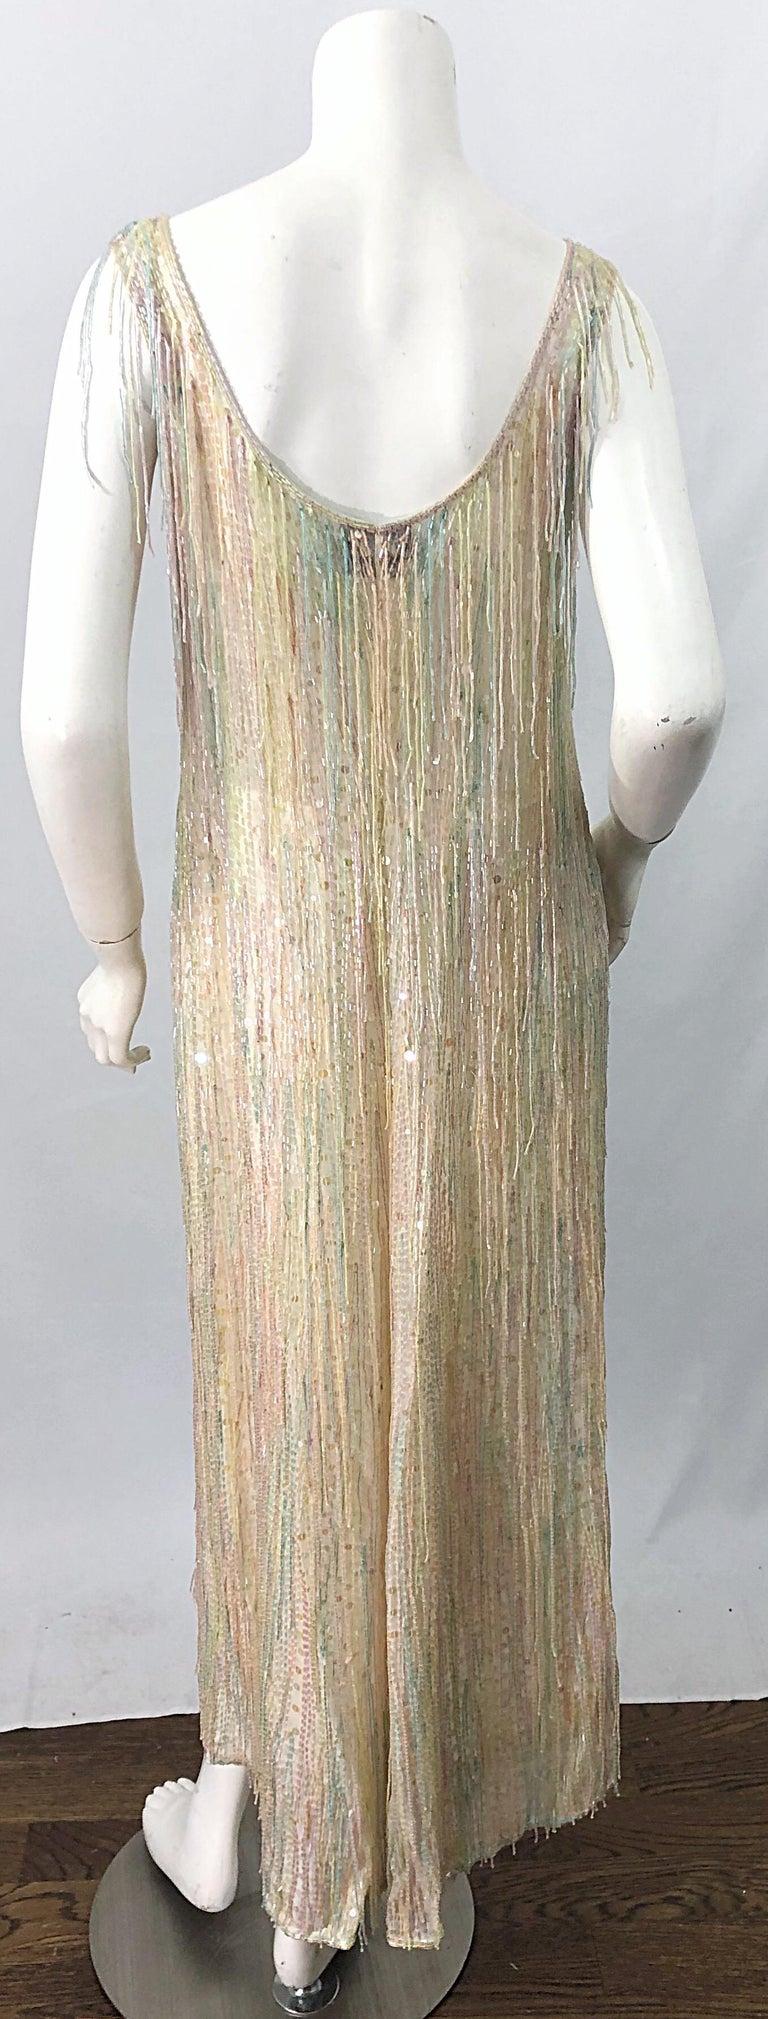 Halston MET Musuem 1970s Fully Fringed Beaded Flapper Style Vintage 70s Dress For Sale 1